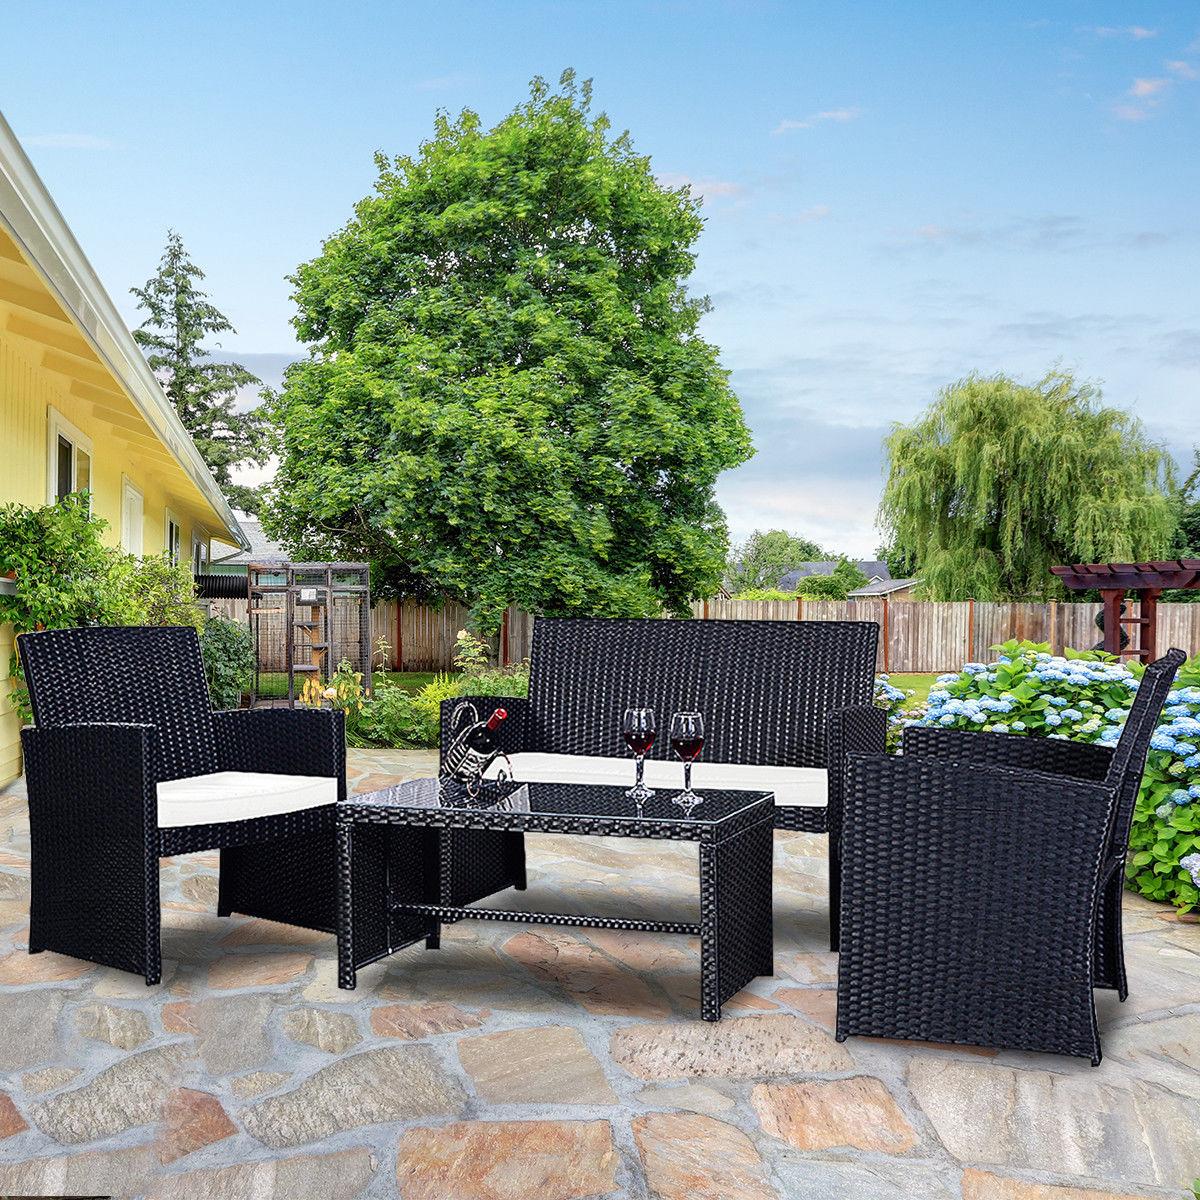 Costway 4 Pc Rattan Patio Furniture Set Garden Lawn Sofa Wicker Cushioned Seat Black 0